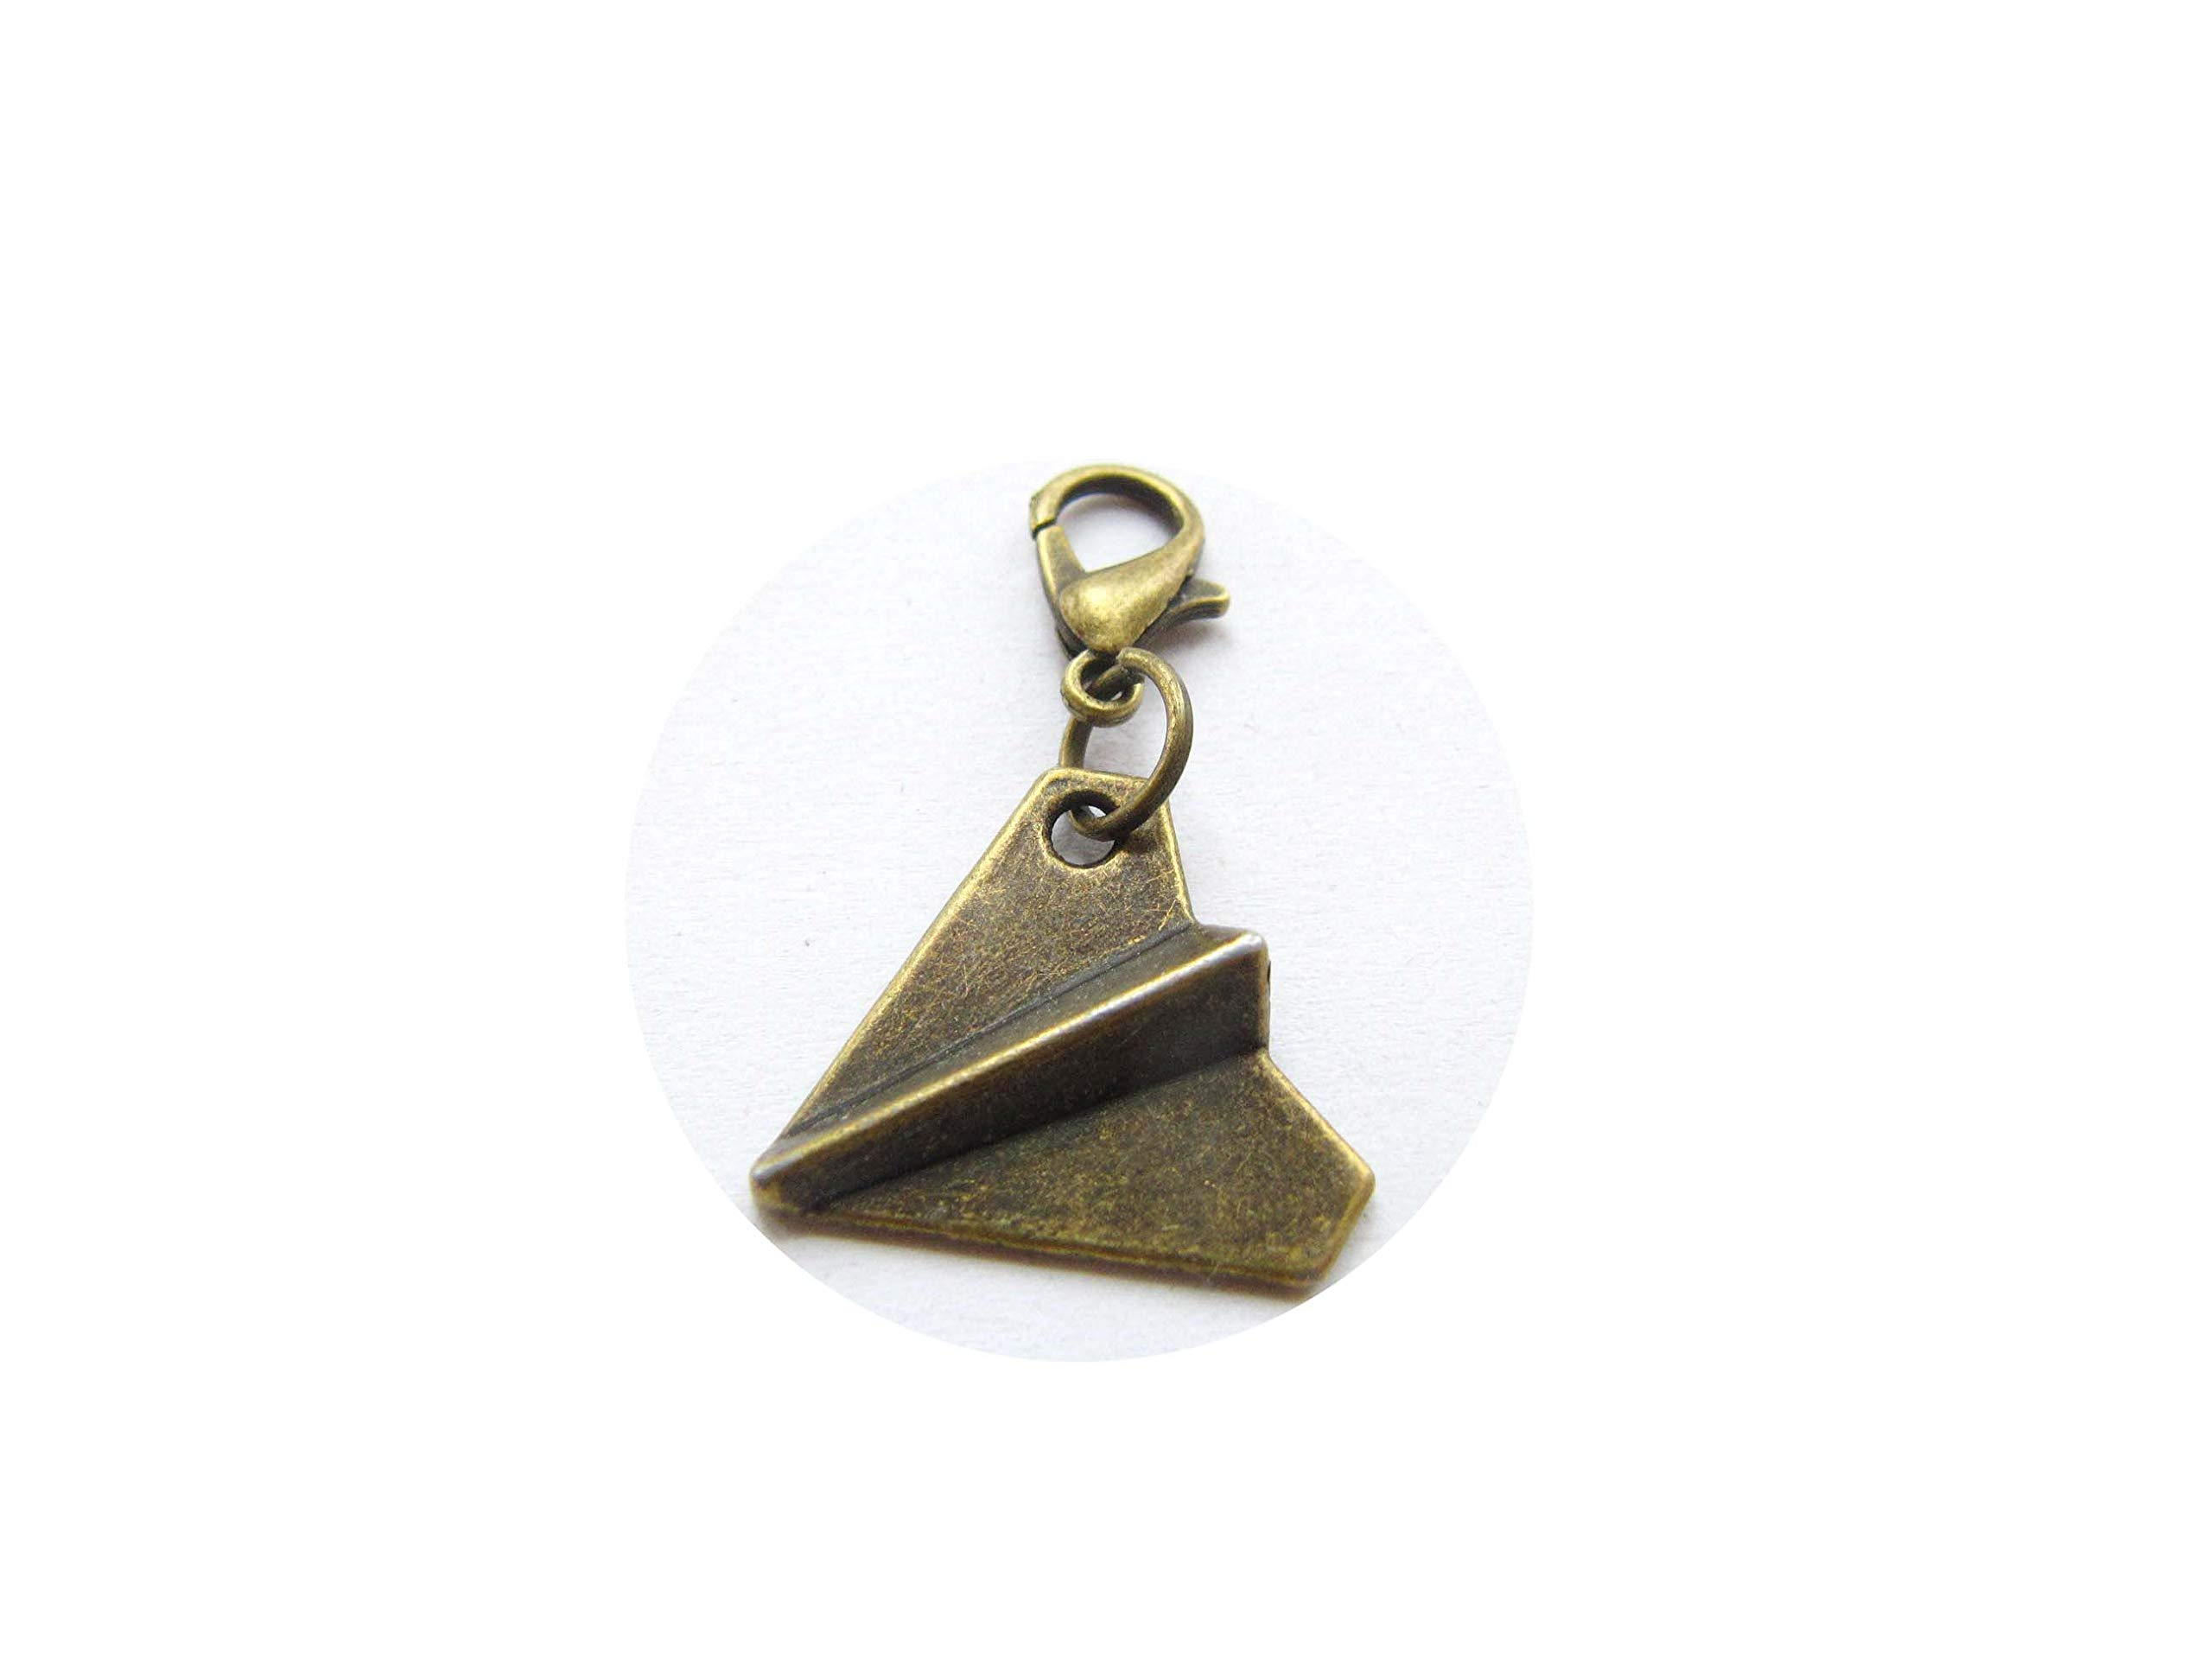 Airplane Zipper Pull, Personalized Airplane, Airplane Zipper Charm, Airplane Gift, AirplaneBag Charm, Travel Charm (Bronze Airplane 1.7x1.9cm)